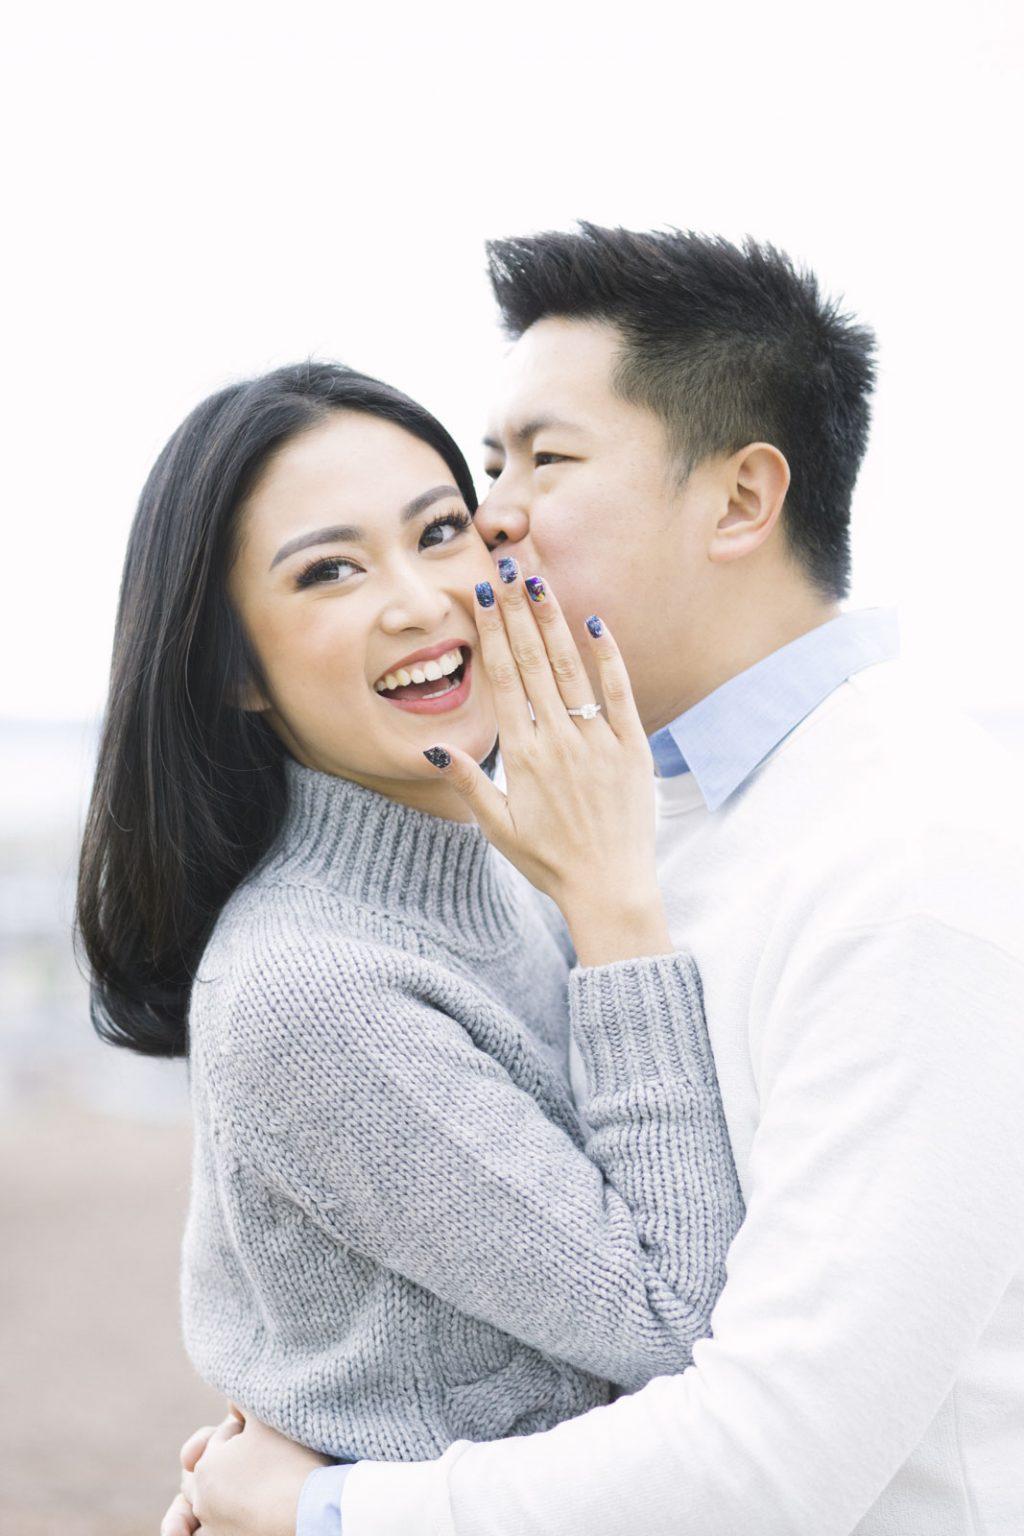 Couple Photoshoot | Suprise Wedding Proposal at Calton Hill | Edinburgh Engagement Photography by Ceranna | Scottish Fine Art Wedding Photographer